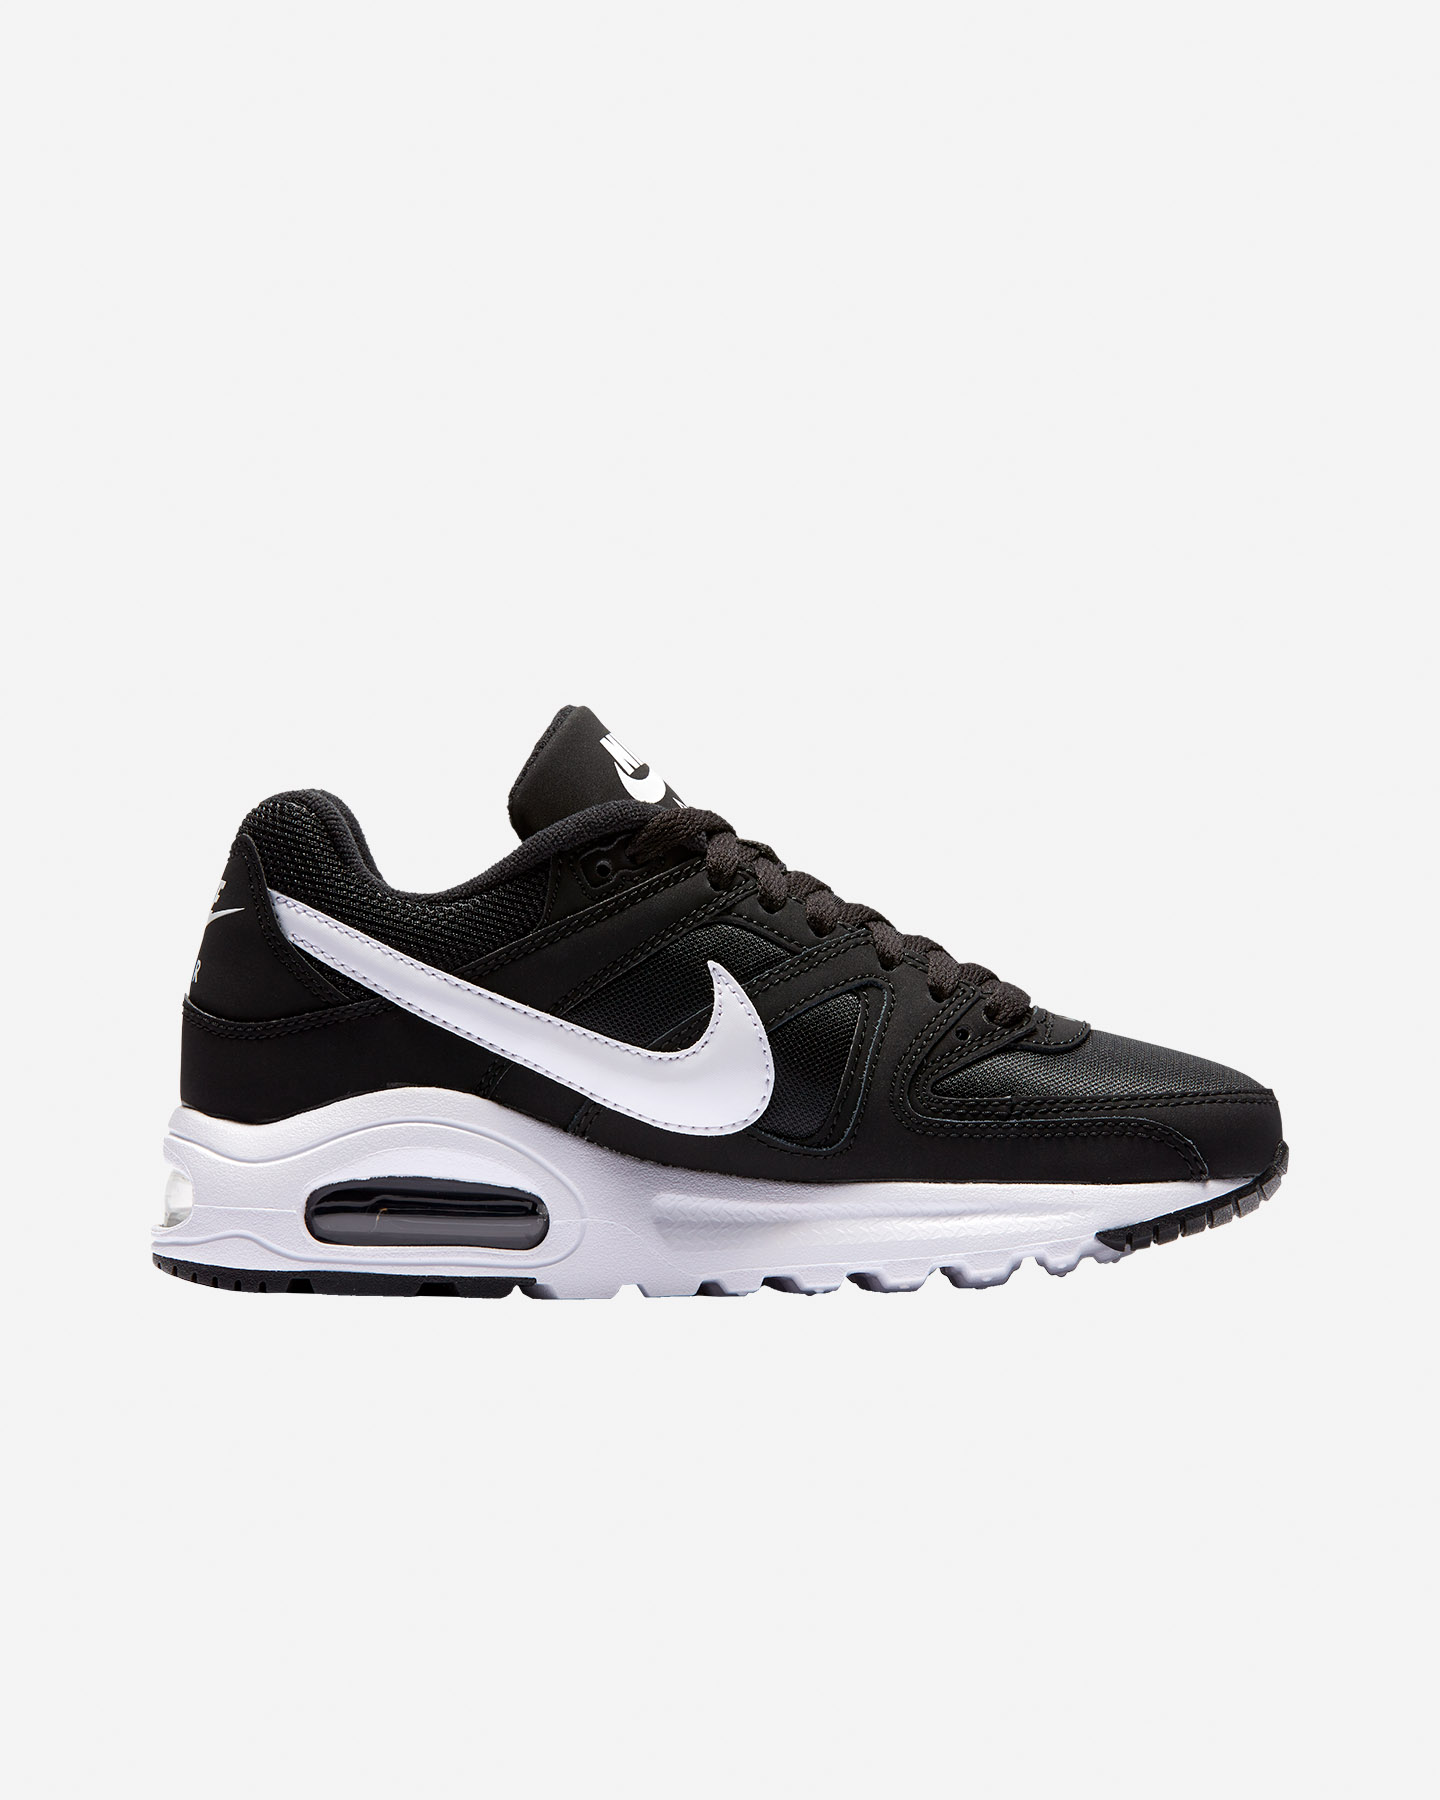 on sale 8dfaa 80d27 Scarpe Sneakers Nike Air Max Command Flex Jr 844346-008   Cisalfa Sport